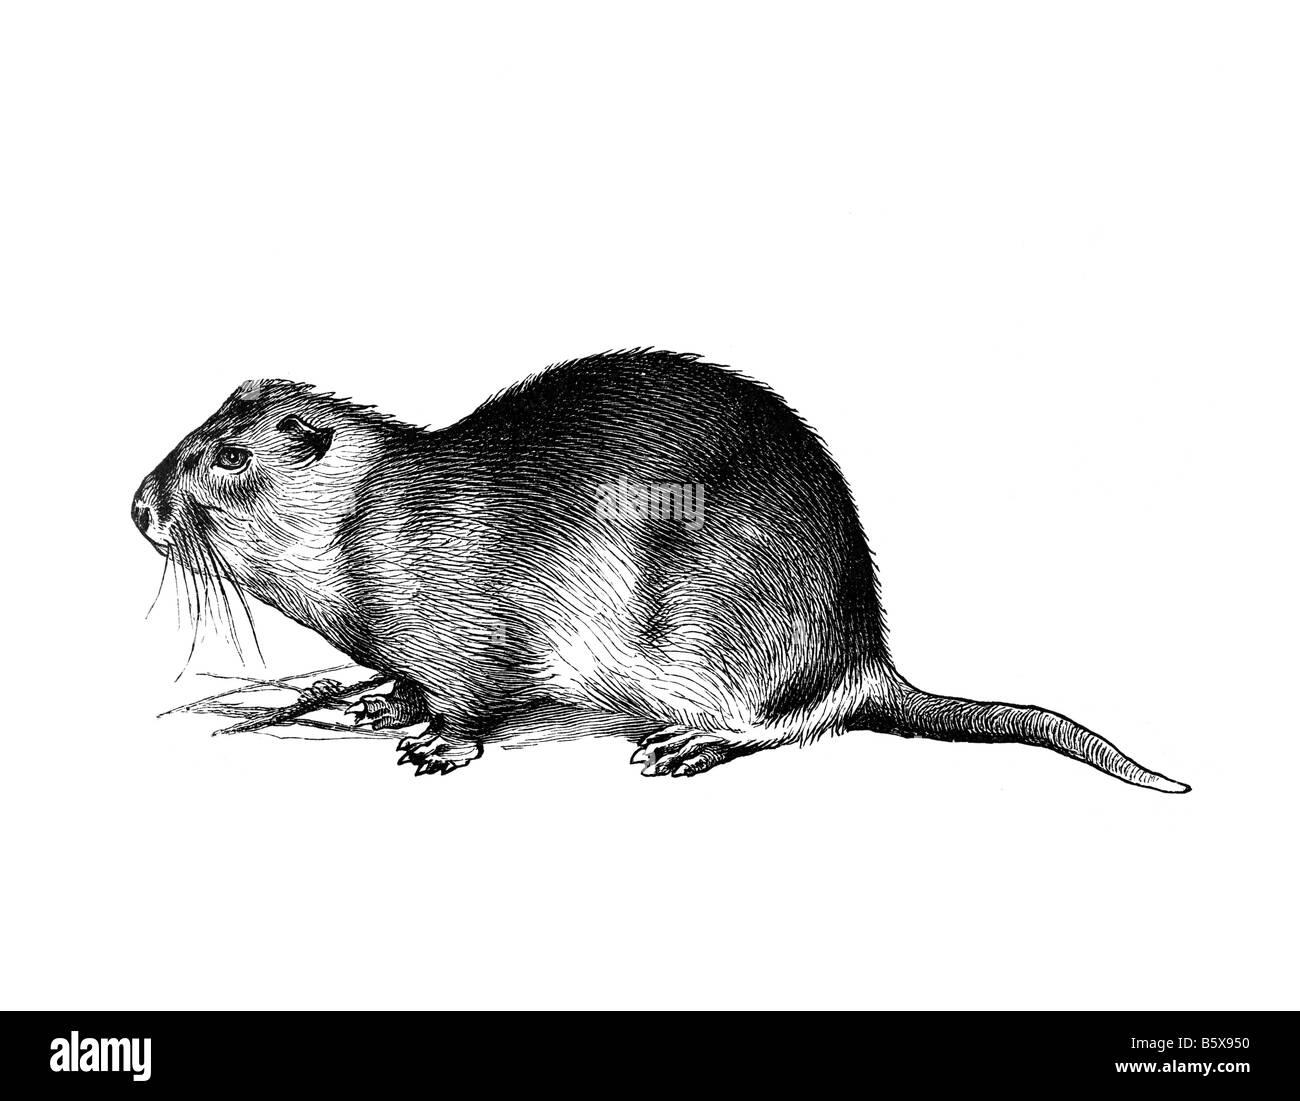 degu, family Octodontidae rodents - Stock Image